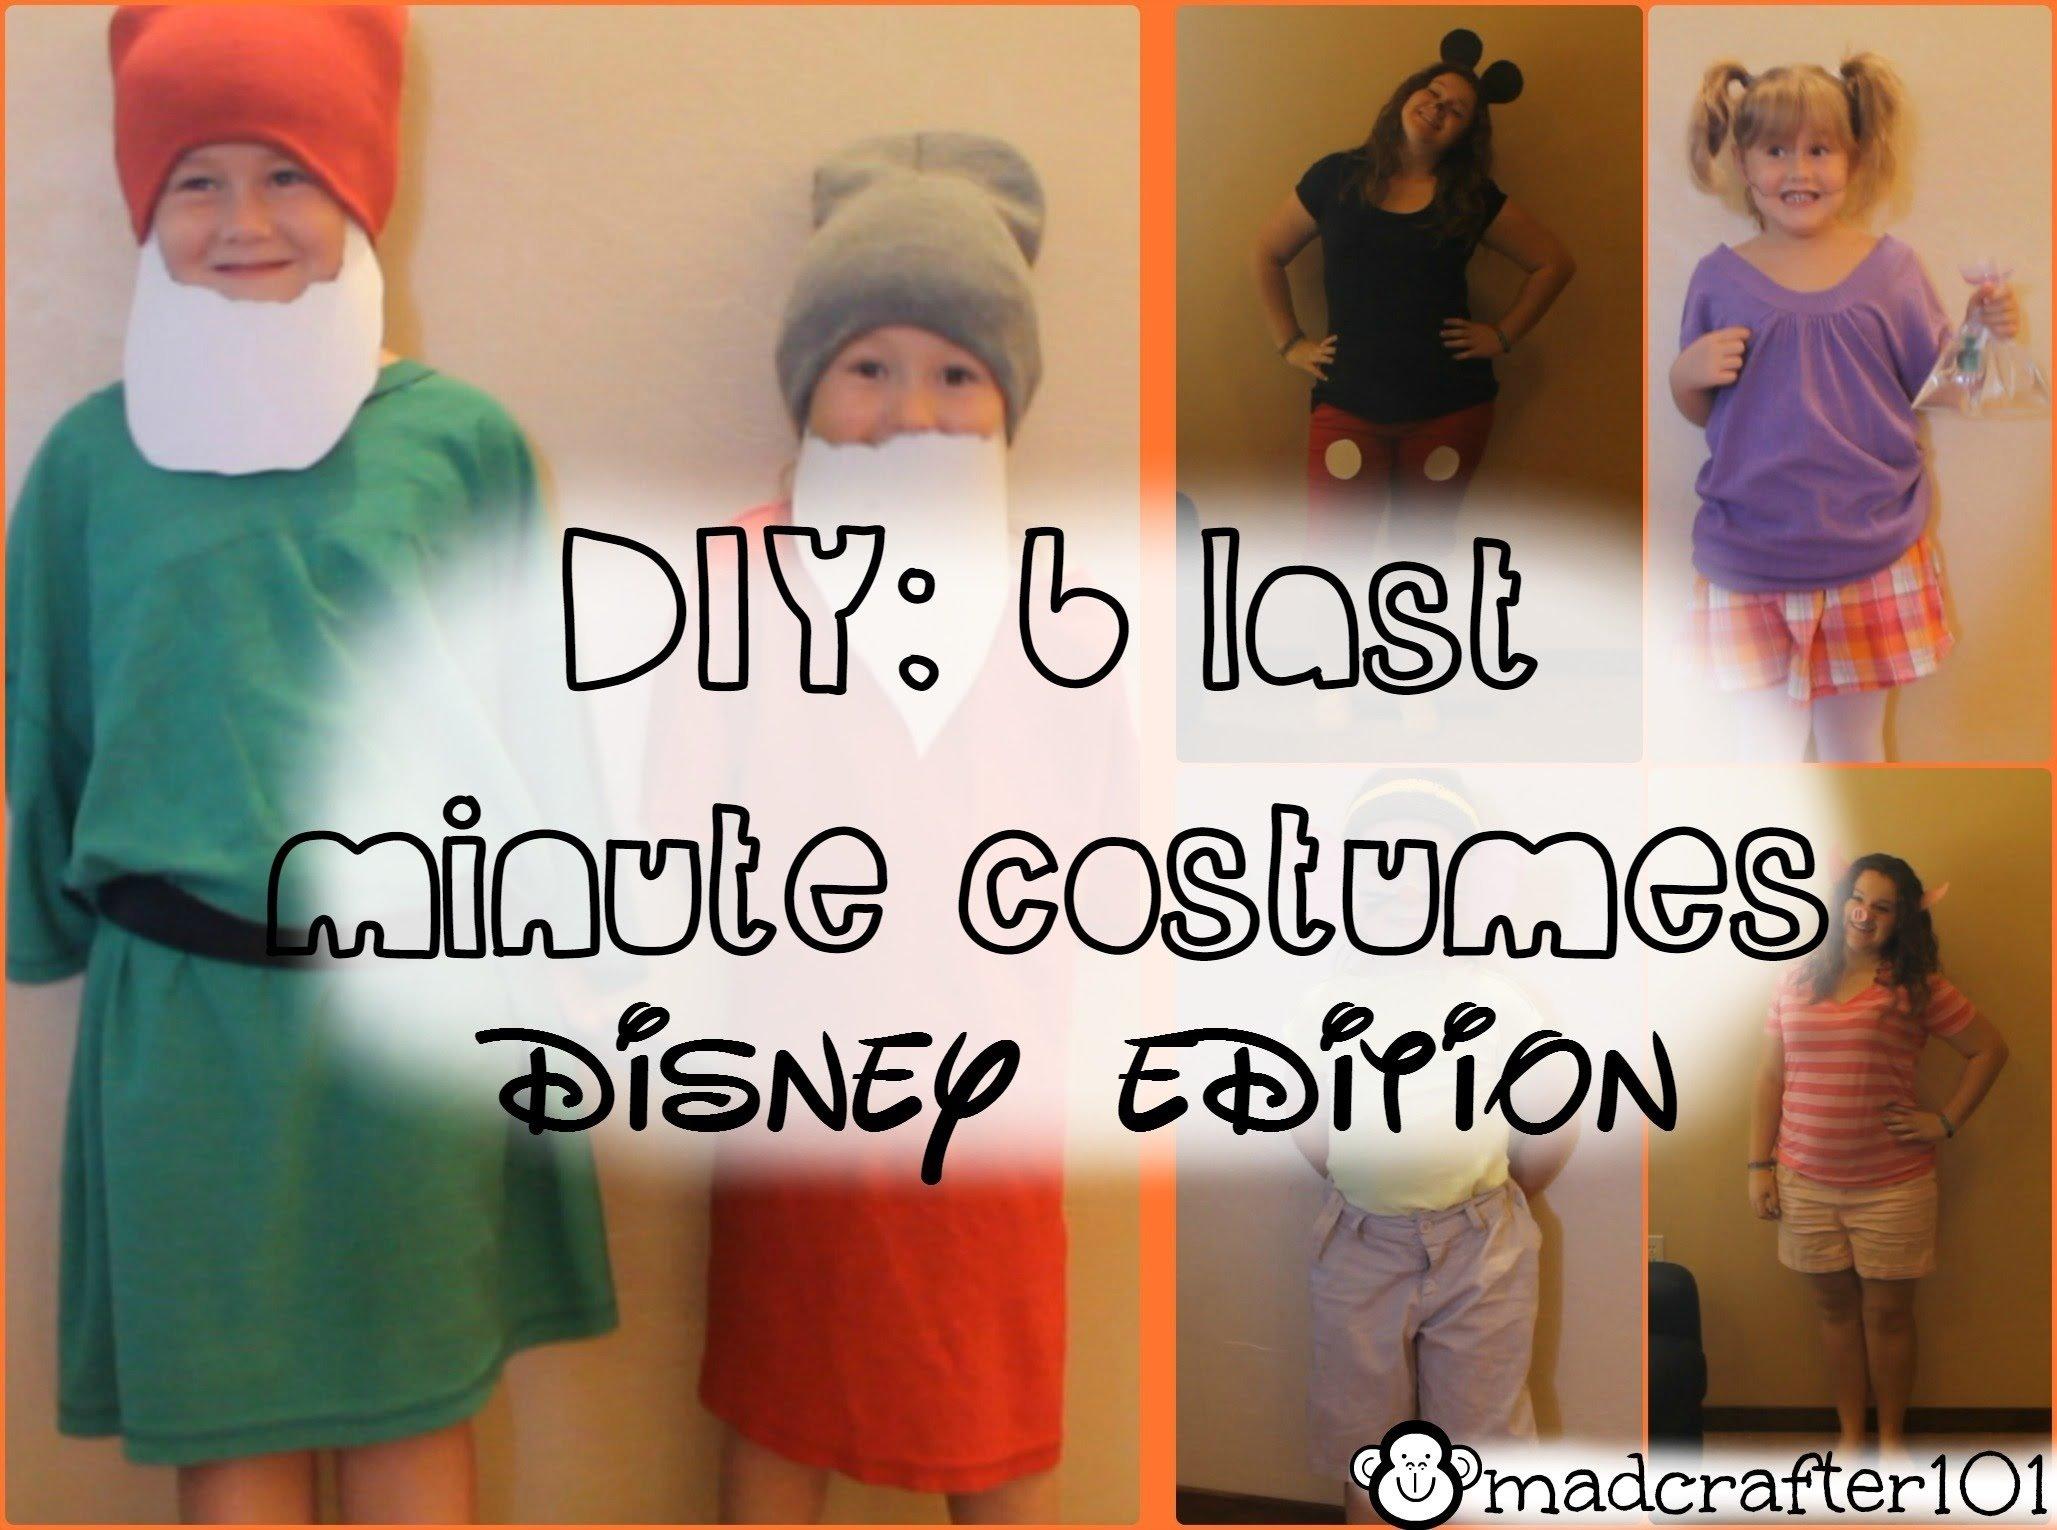 10 Beautiful Disney Character Dress Up Ideas diy 6 last minute halloween costumes disney edition youtube 2020